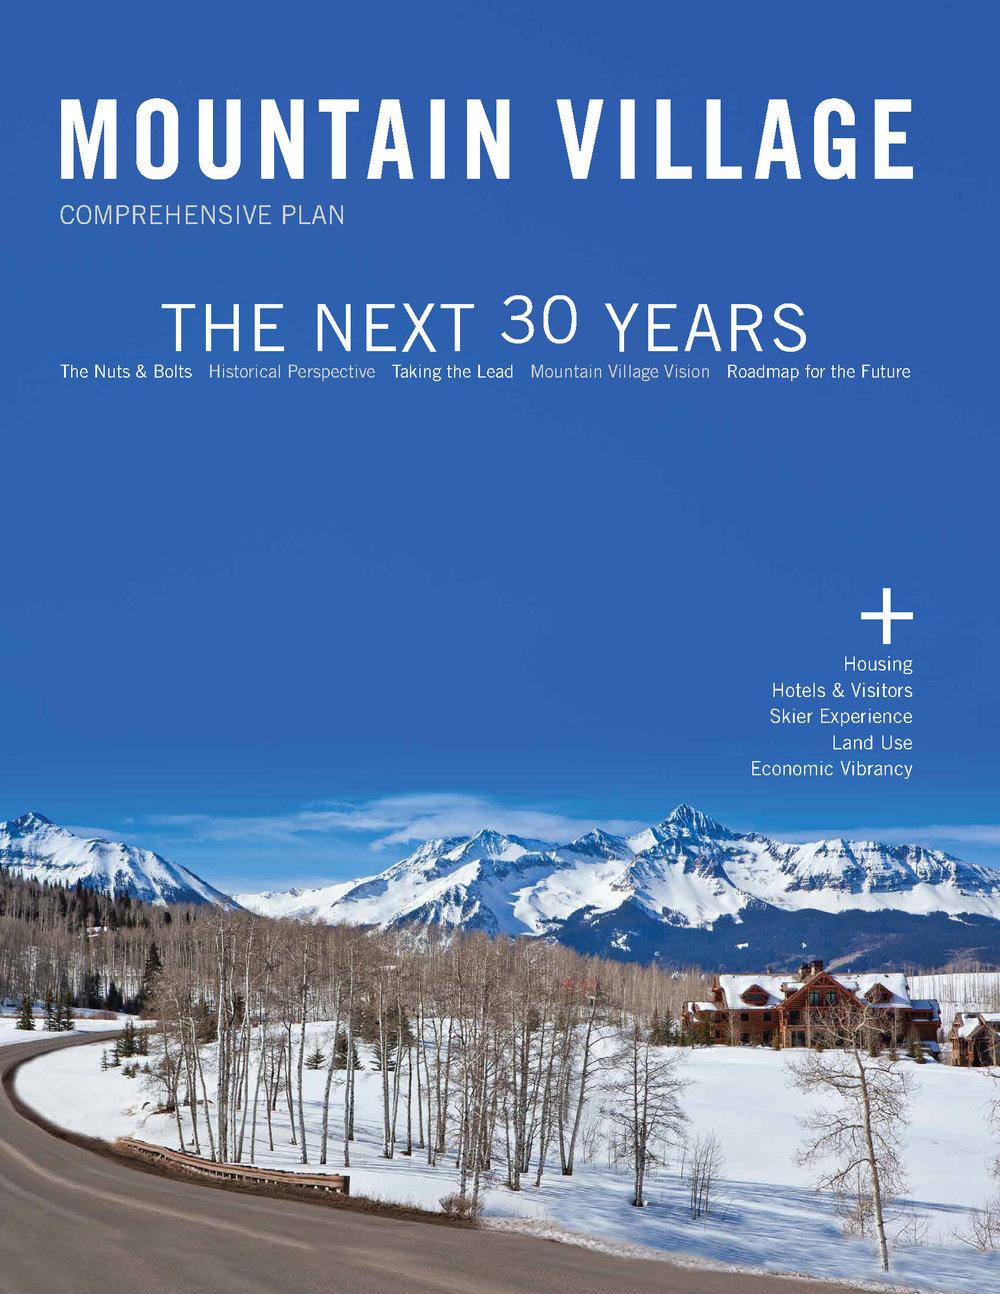 Mountain Village Comprehensive Plan Cover Photo - Copy - Copy.jpg